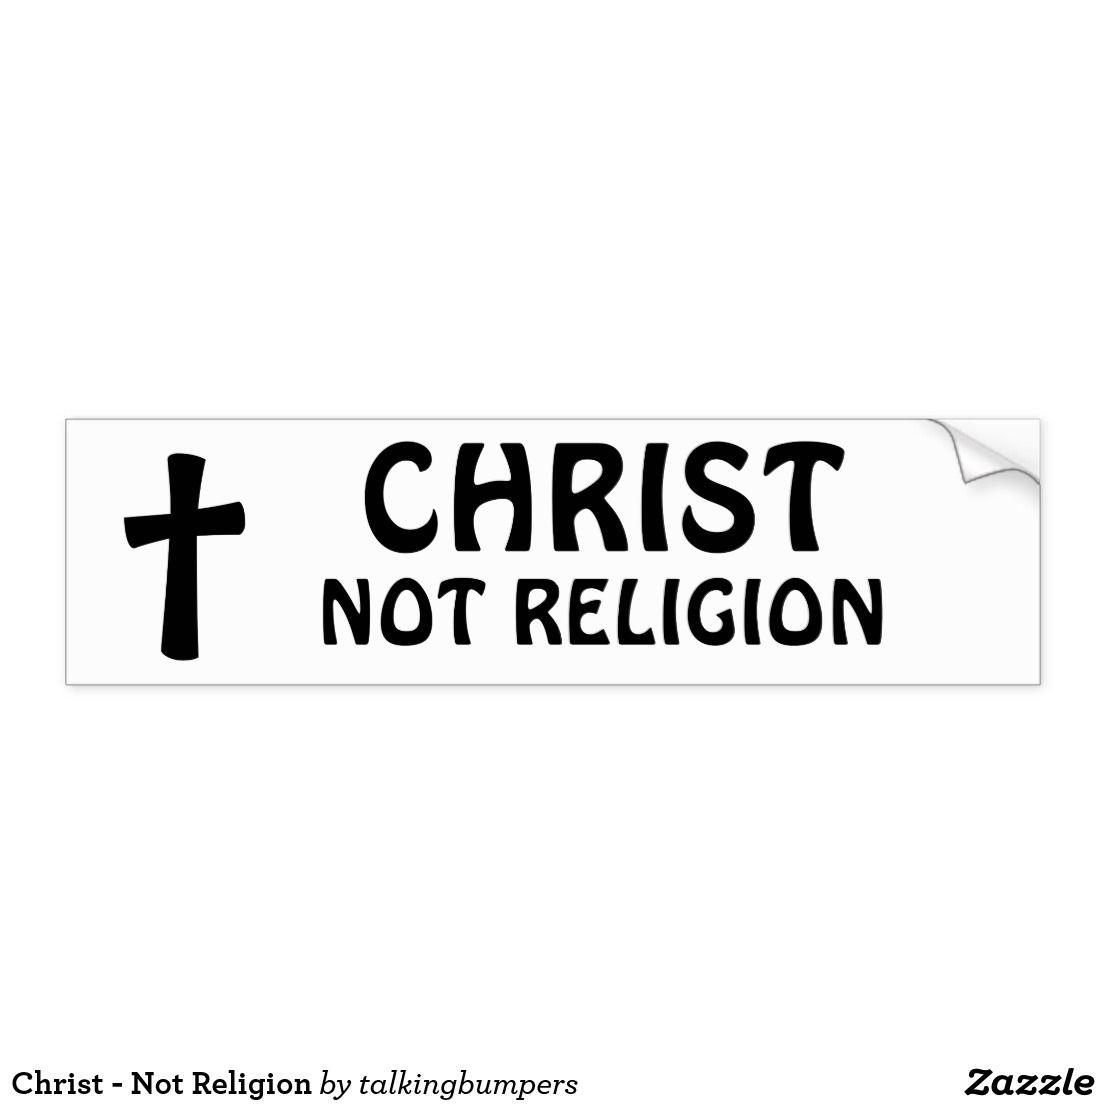 Christ not religion bumper sticker christianity is not a christ not religion bumper sticker christianity is not a religion but a faith biocorpaavc